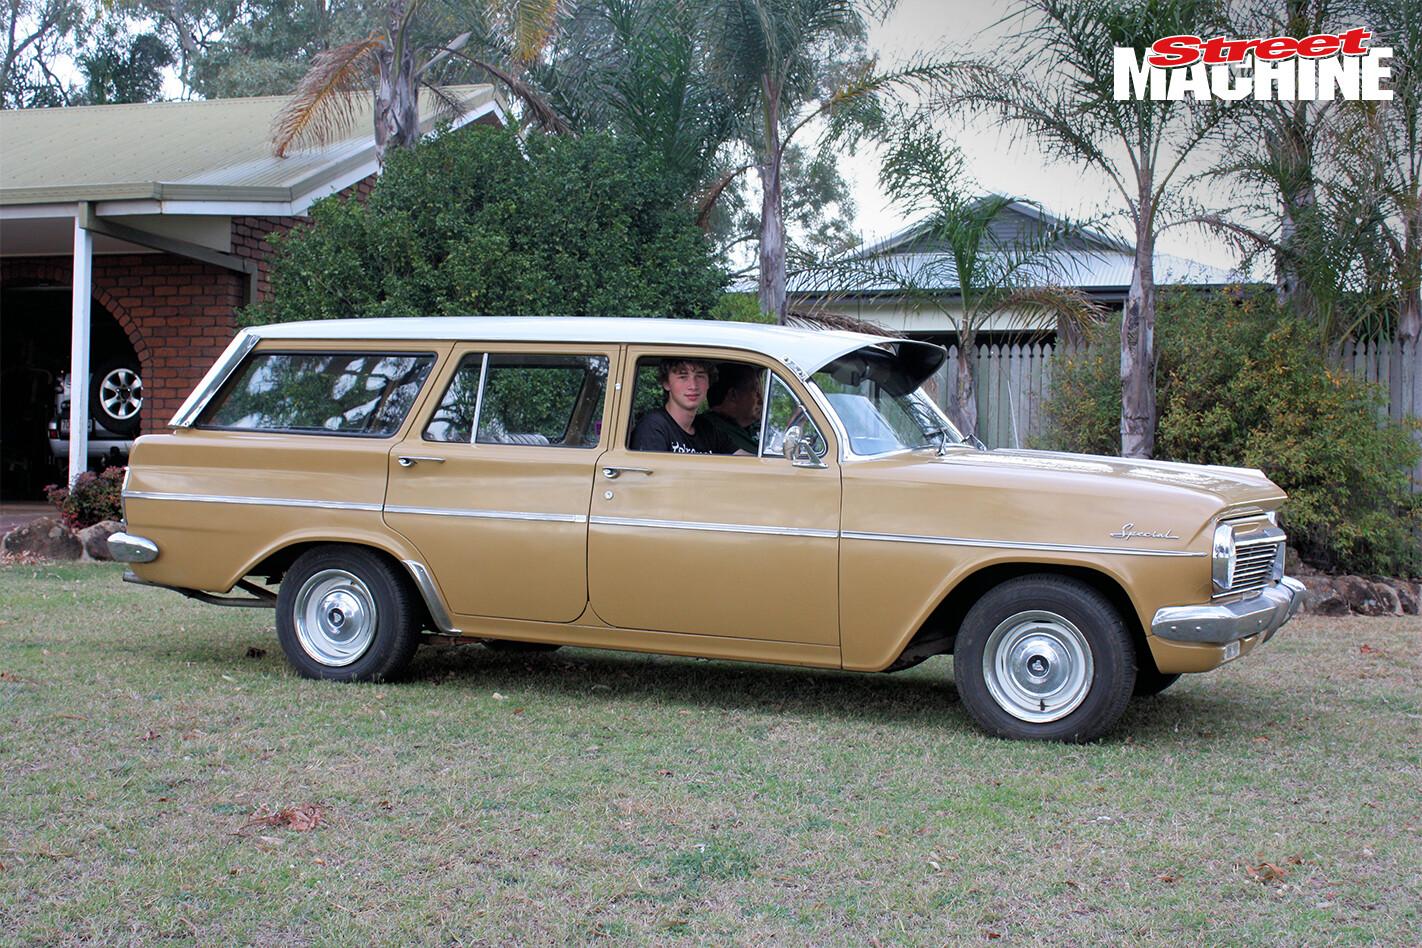 Kieran Robinson's EH Holden wagon